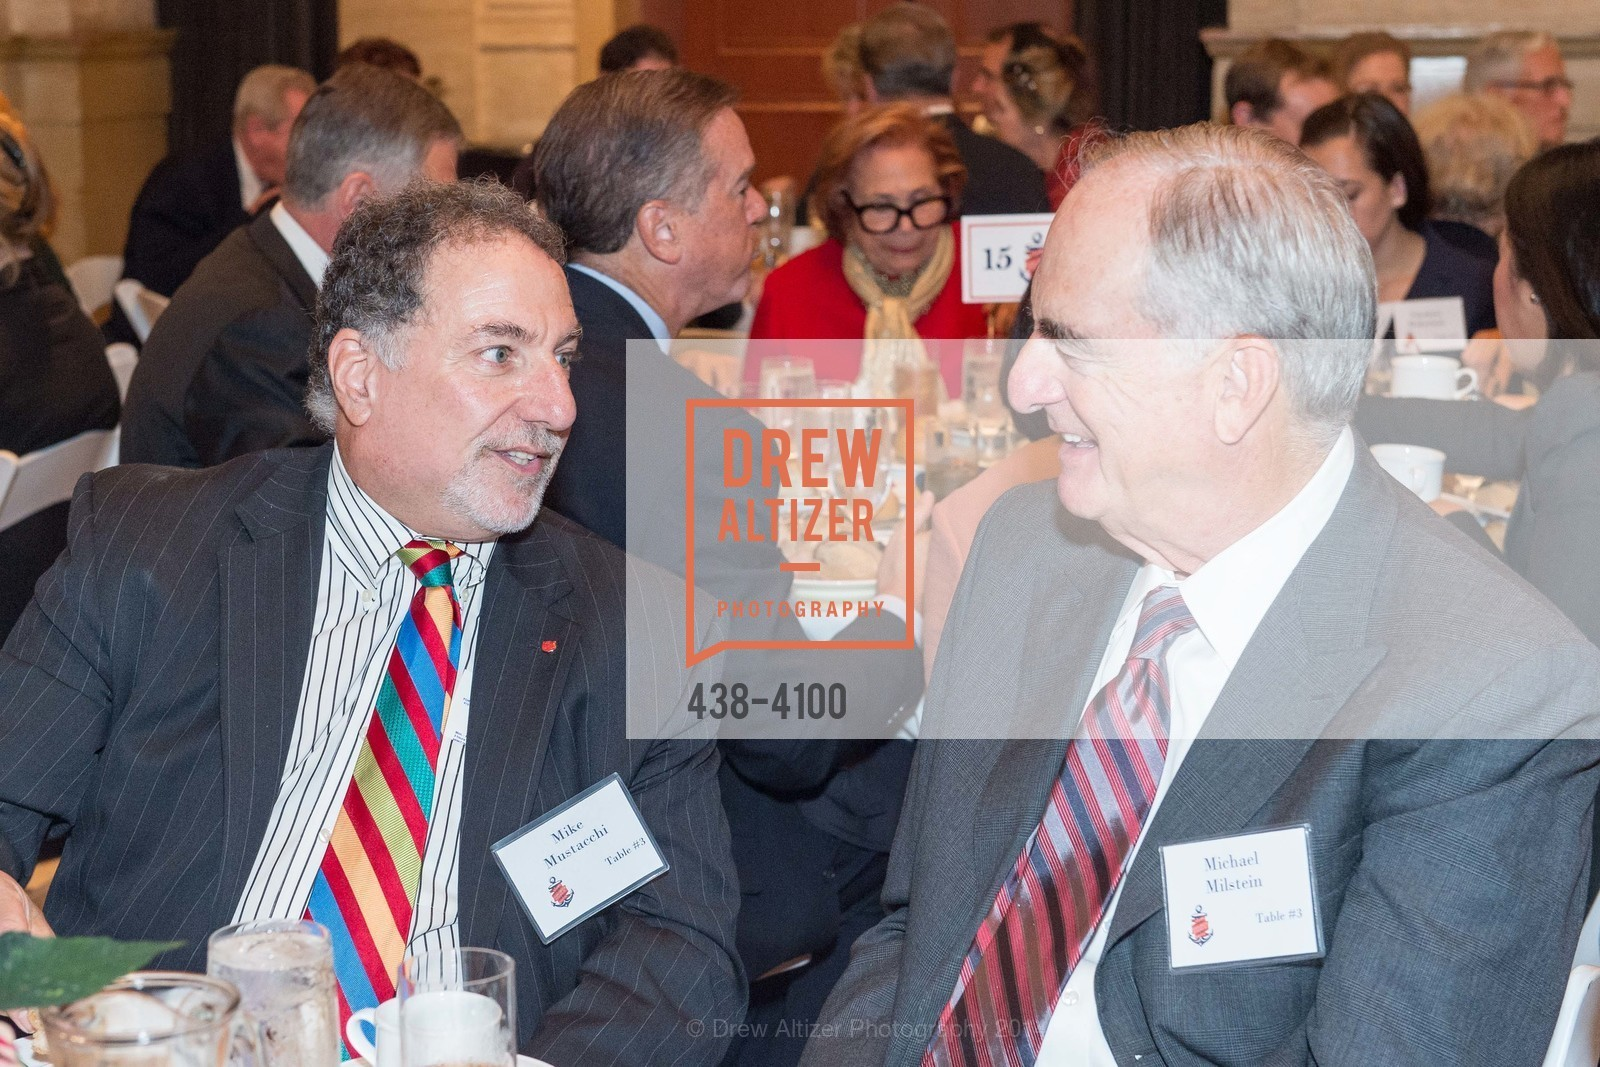 Mike Mustacchi, Michael Milstein, Photo #438-4100